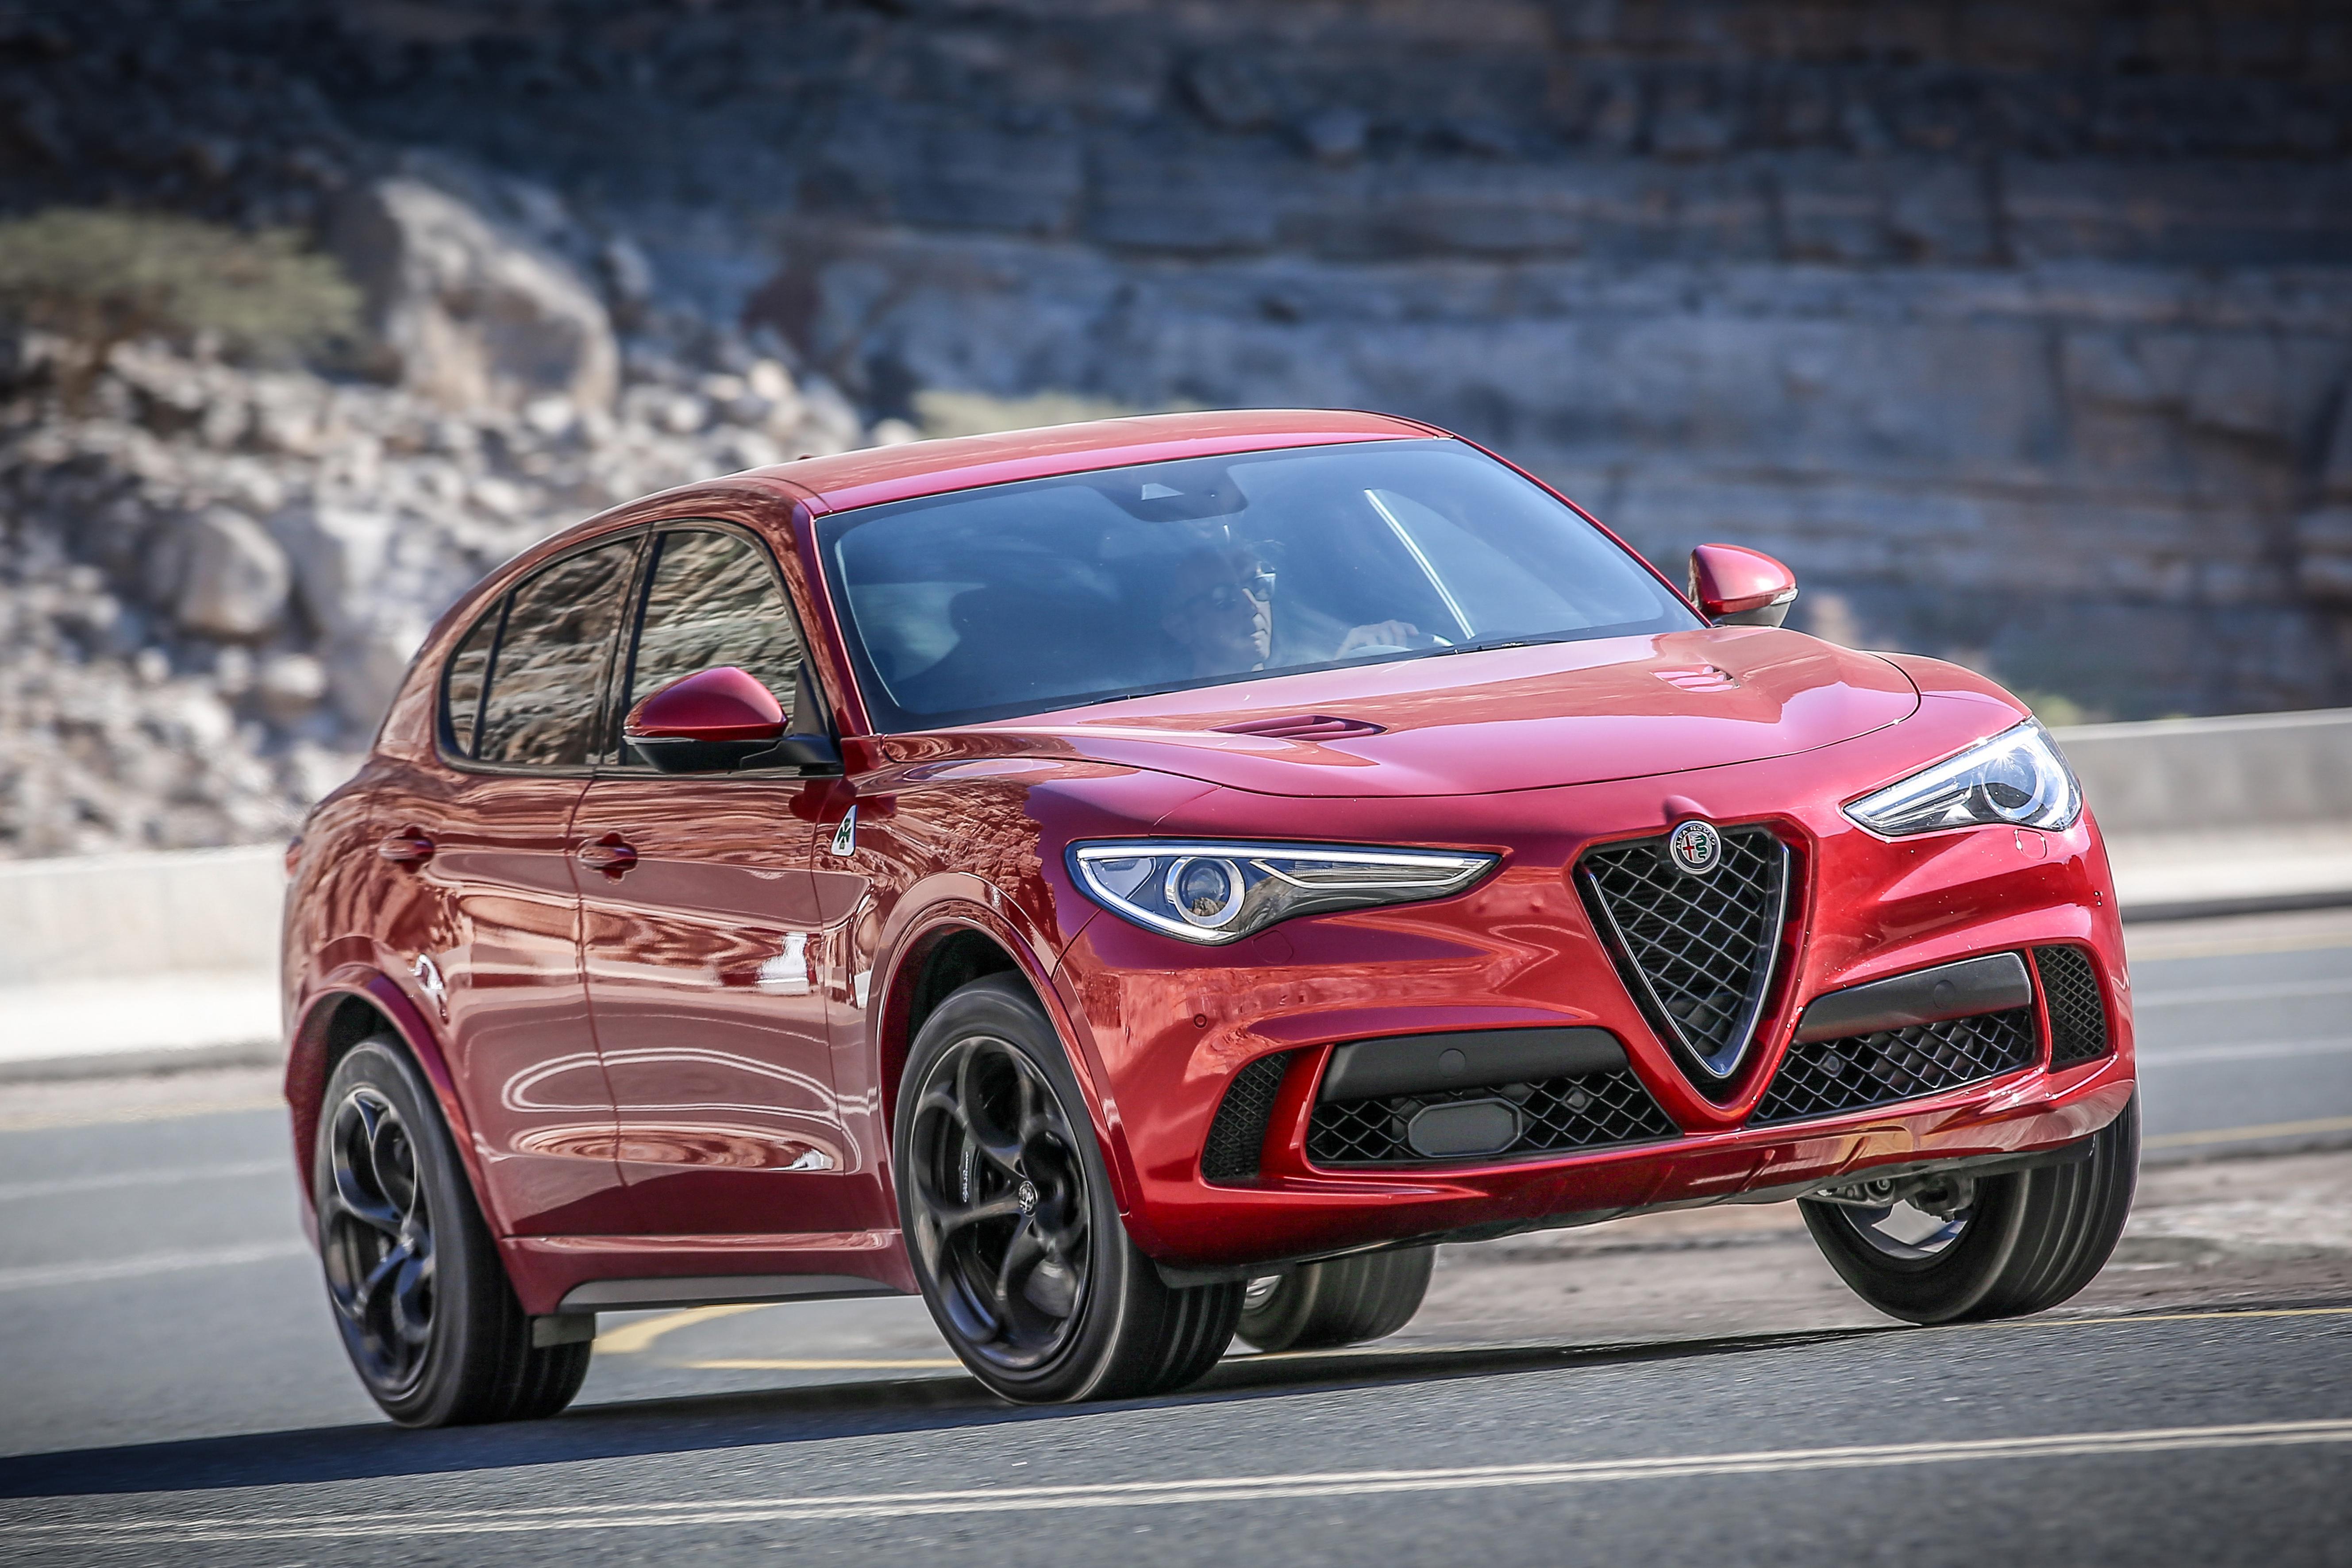 2018 Alfa Romeo Stelvio Quadrifoglio.